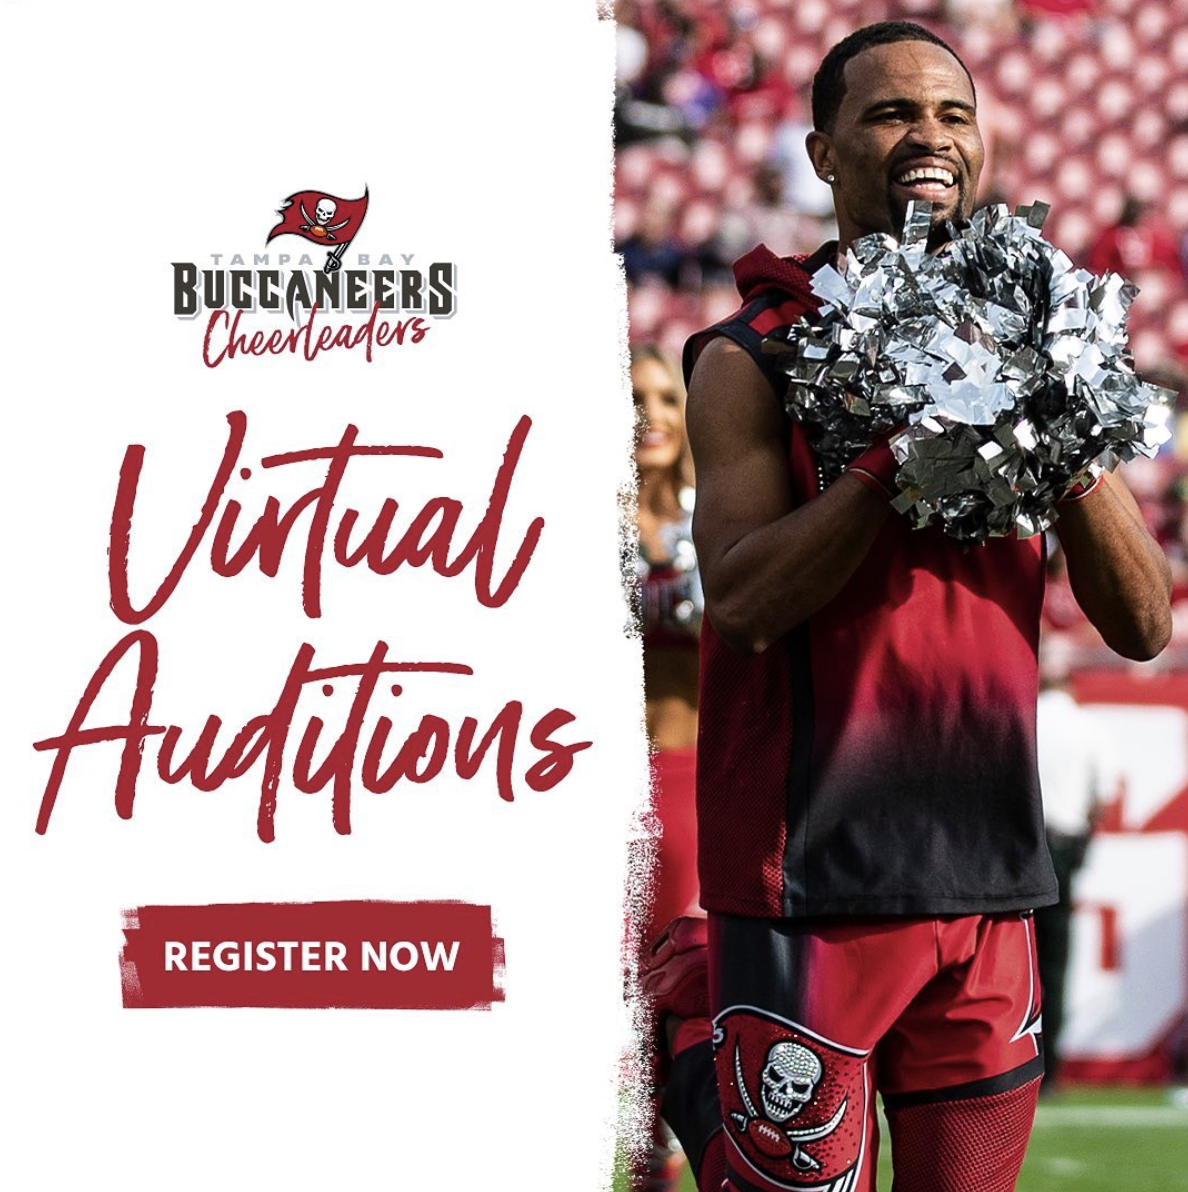 2020 Nfl Tampa Bay Buccaneers Cheerleaders Virtual Auditions With Buccaneers Cheerleaders Women 2020 In A Bikini